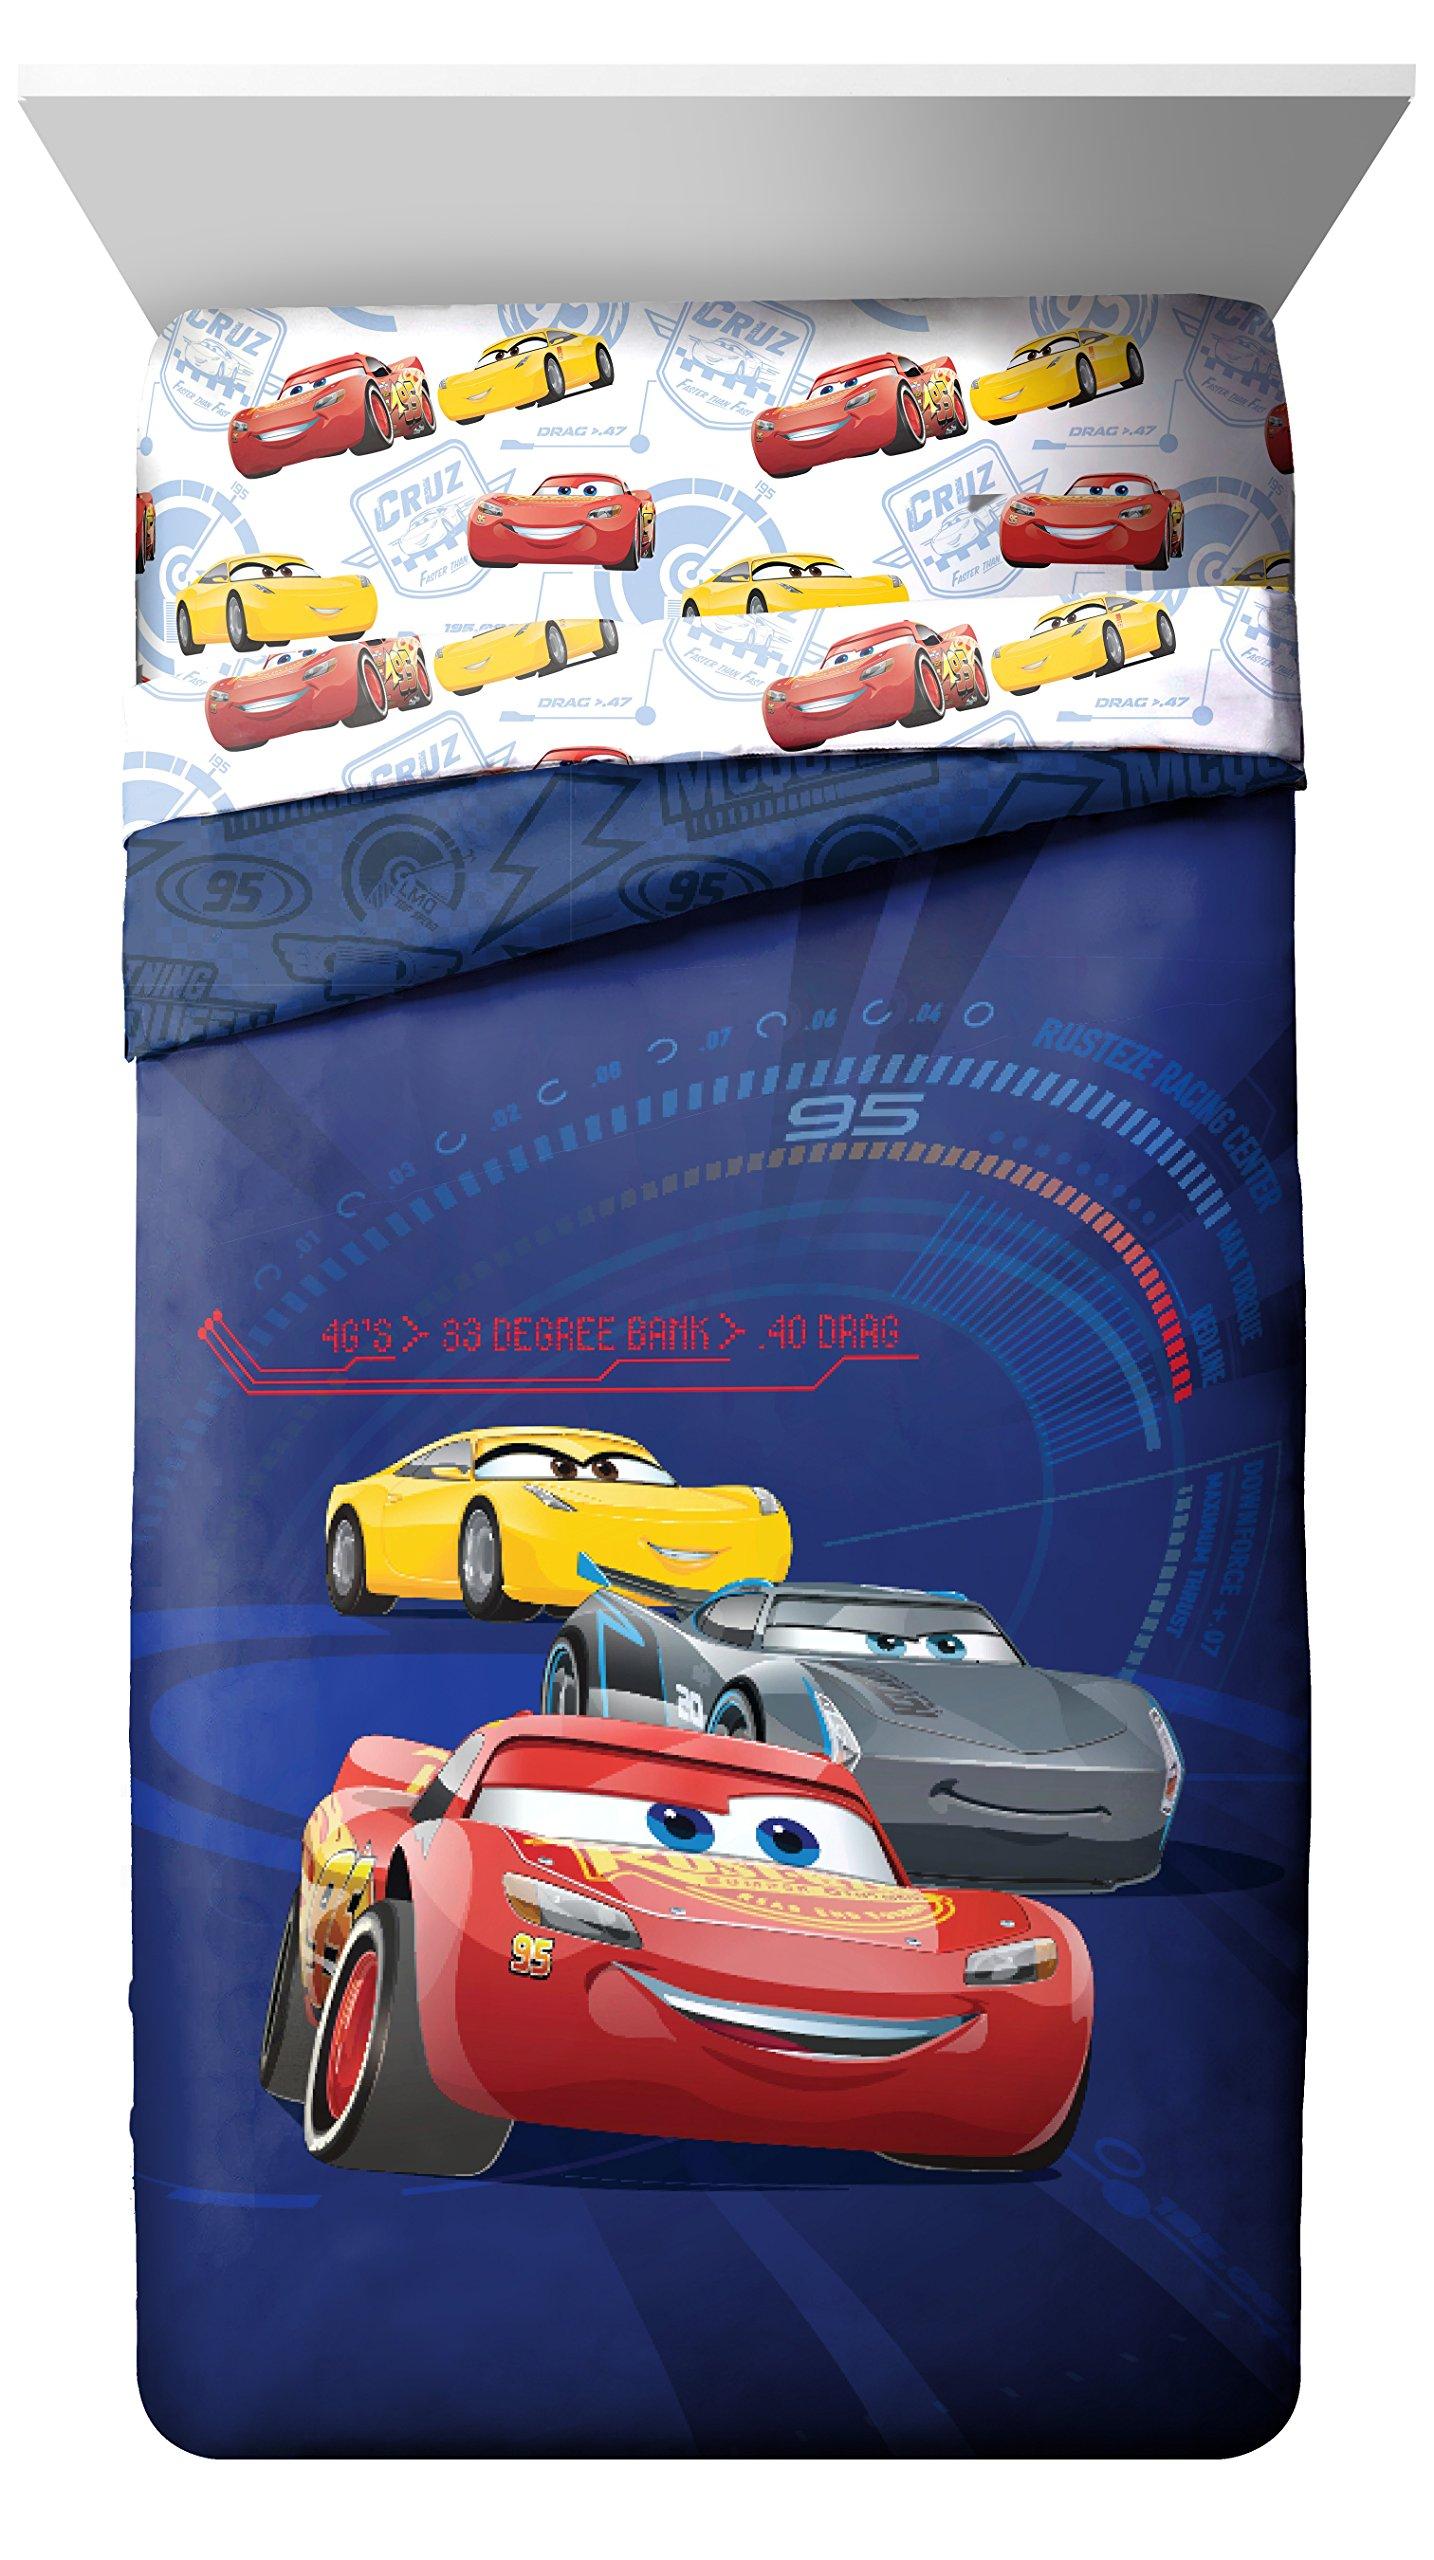 Disney Pixar Cars 3 High Tech Twin Comforter - Super Soft Kids Reversible Bedding features Lightning McQueen - Fade Resistant Polyester Microfiber Fill (Official Pixar Product)